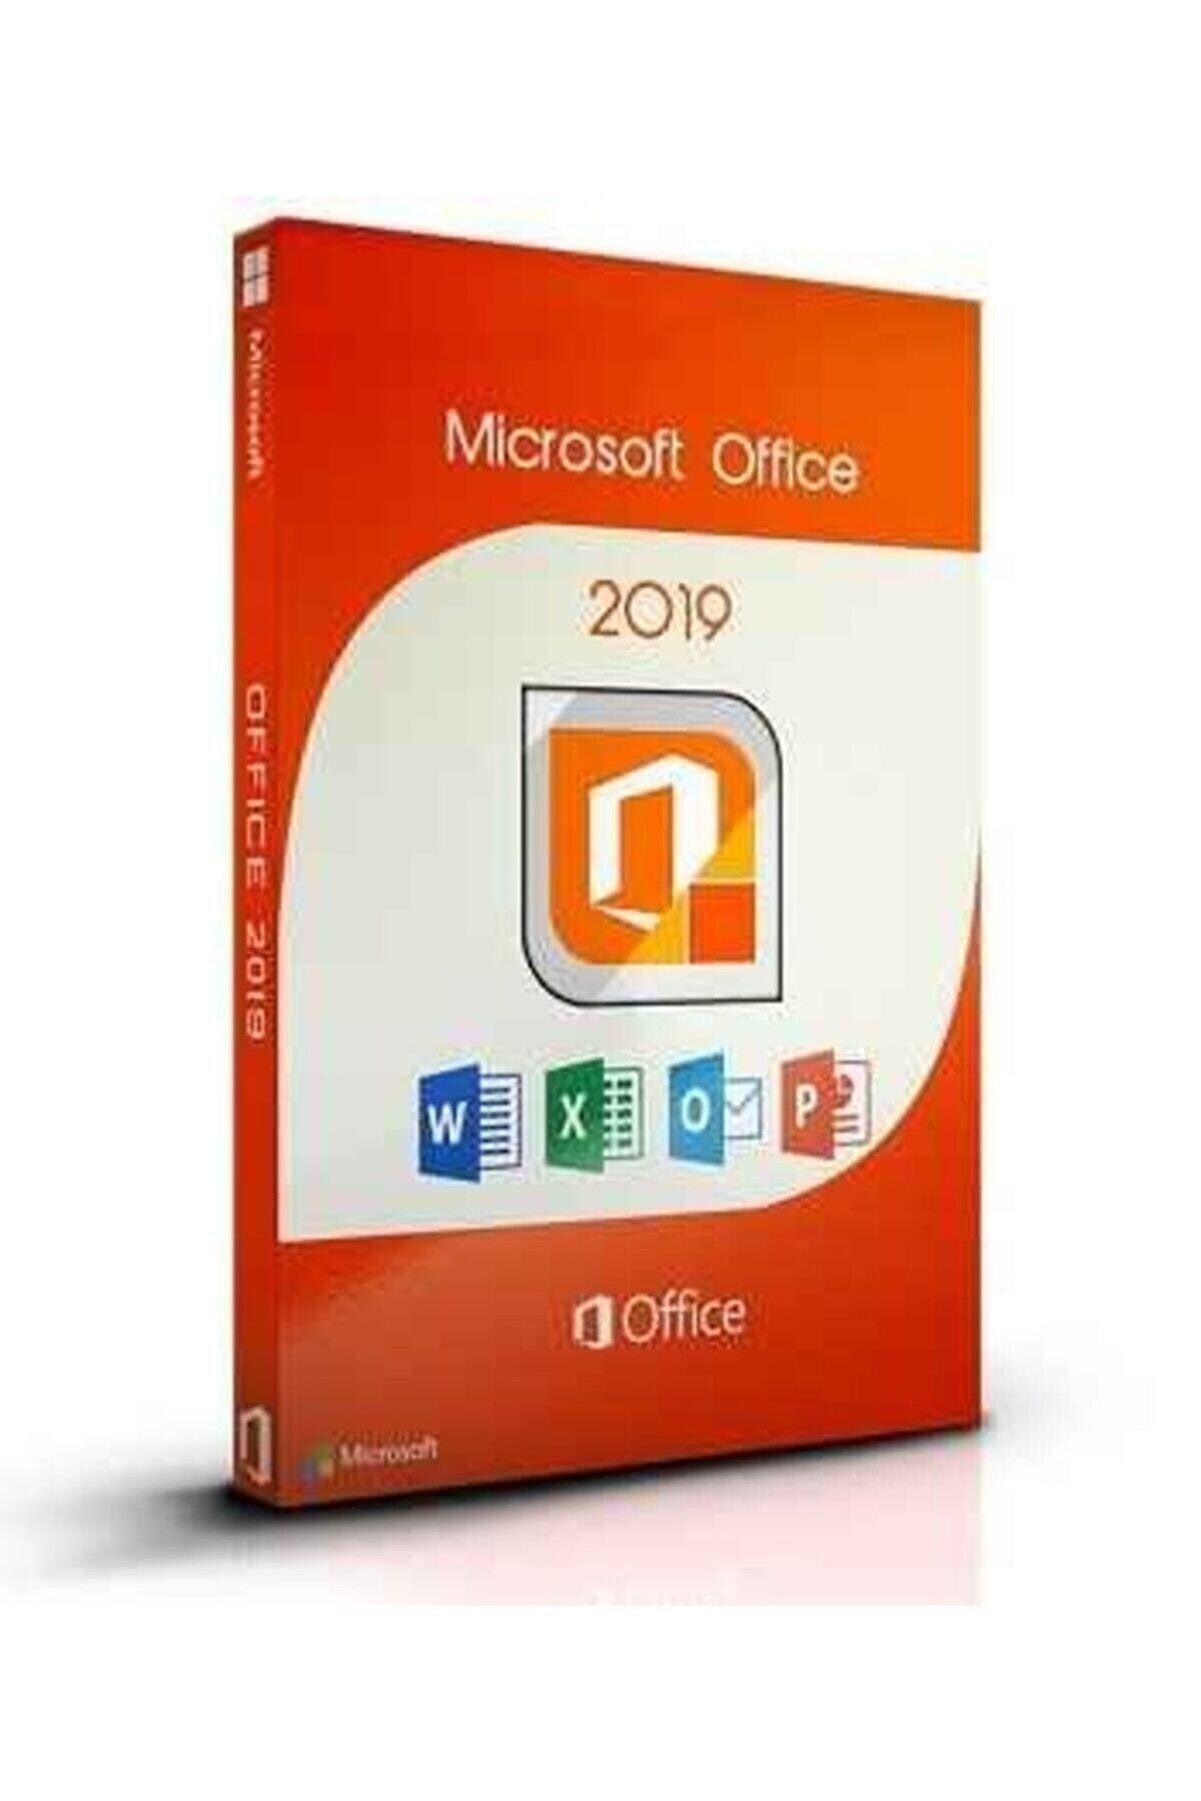 Microsoft Office 2019 Pro Plus Lisans Anahtarı-1 Pc